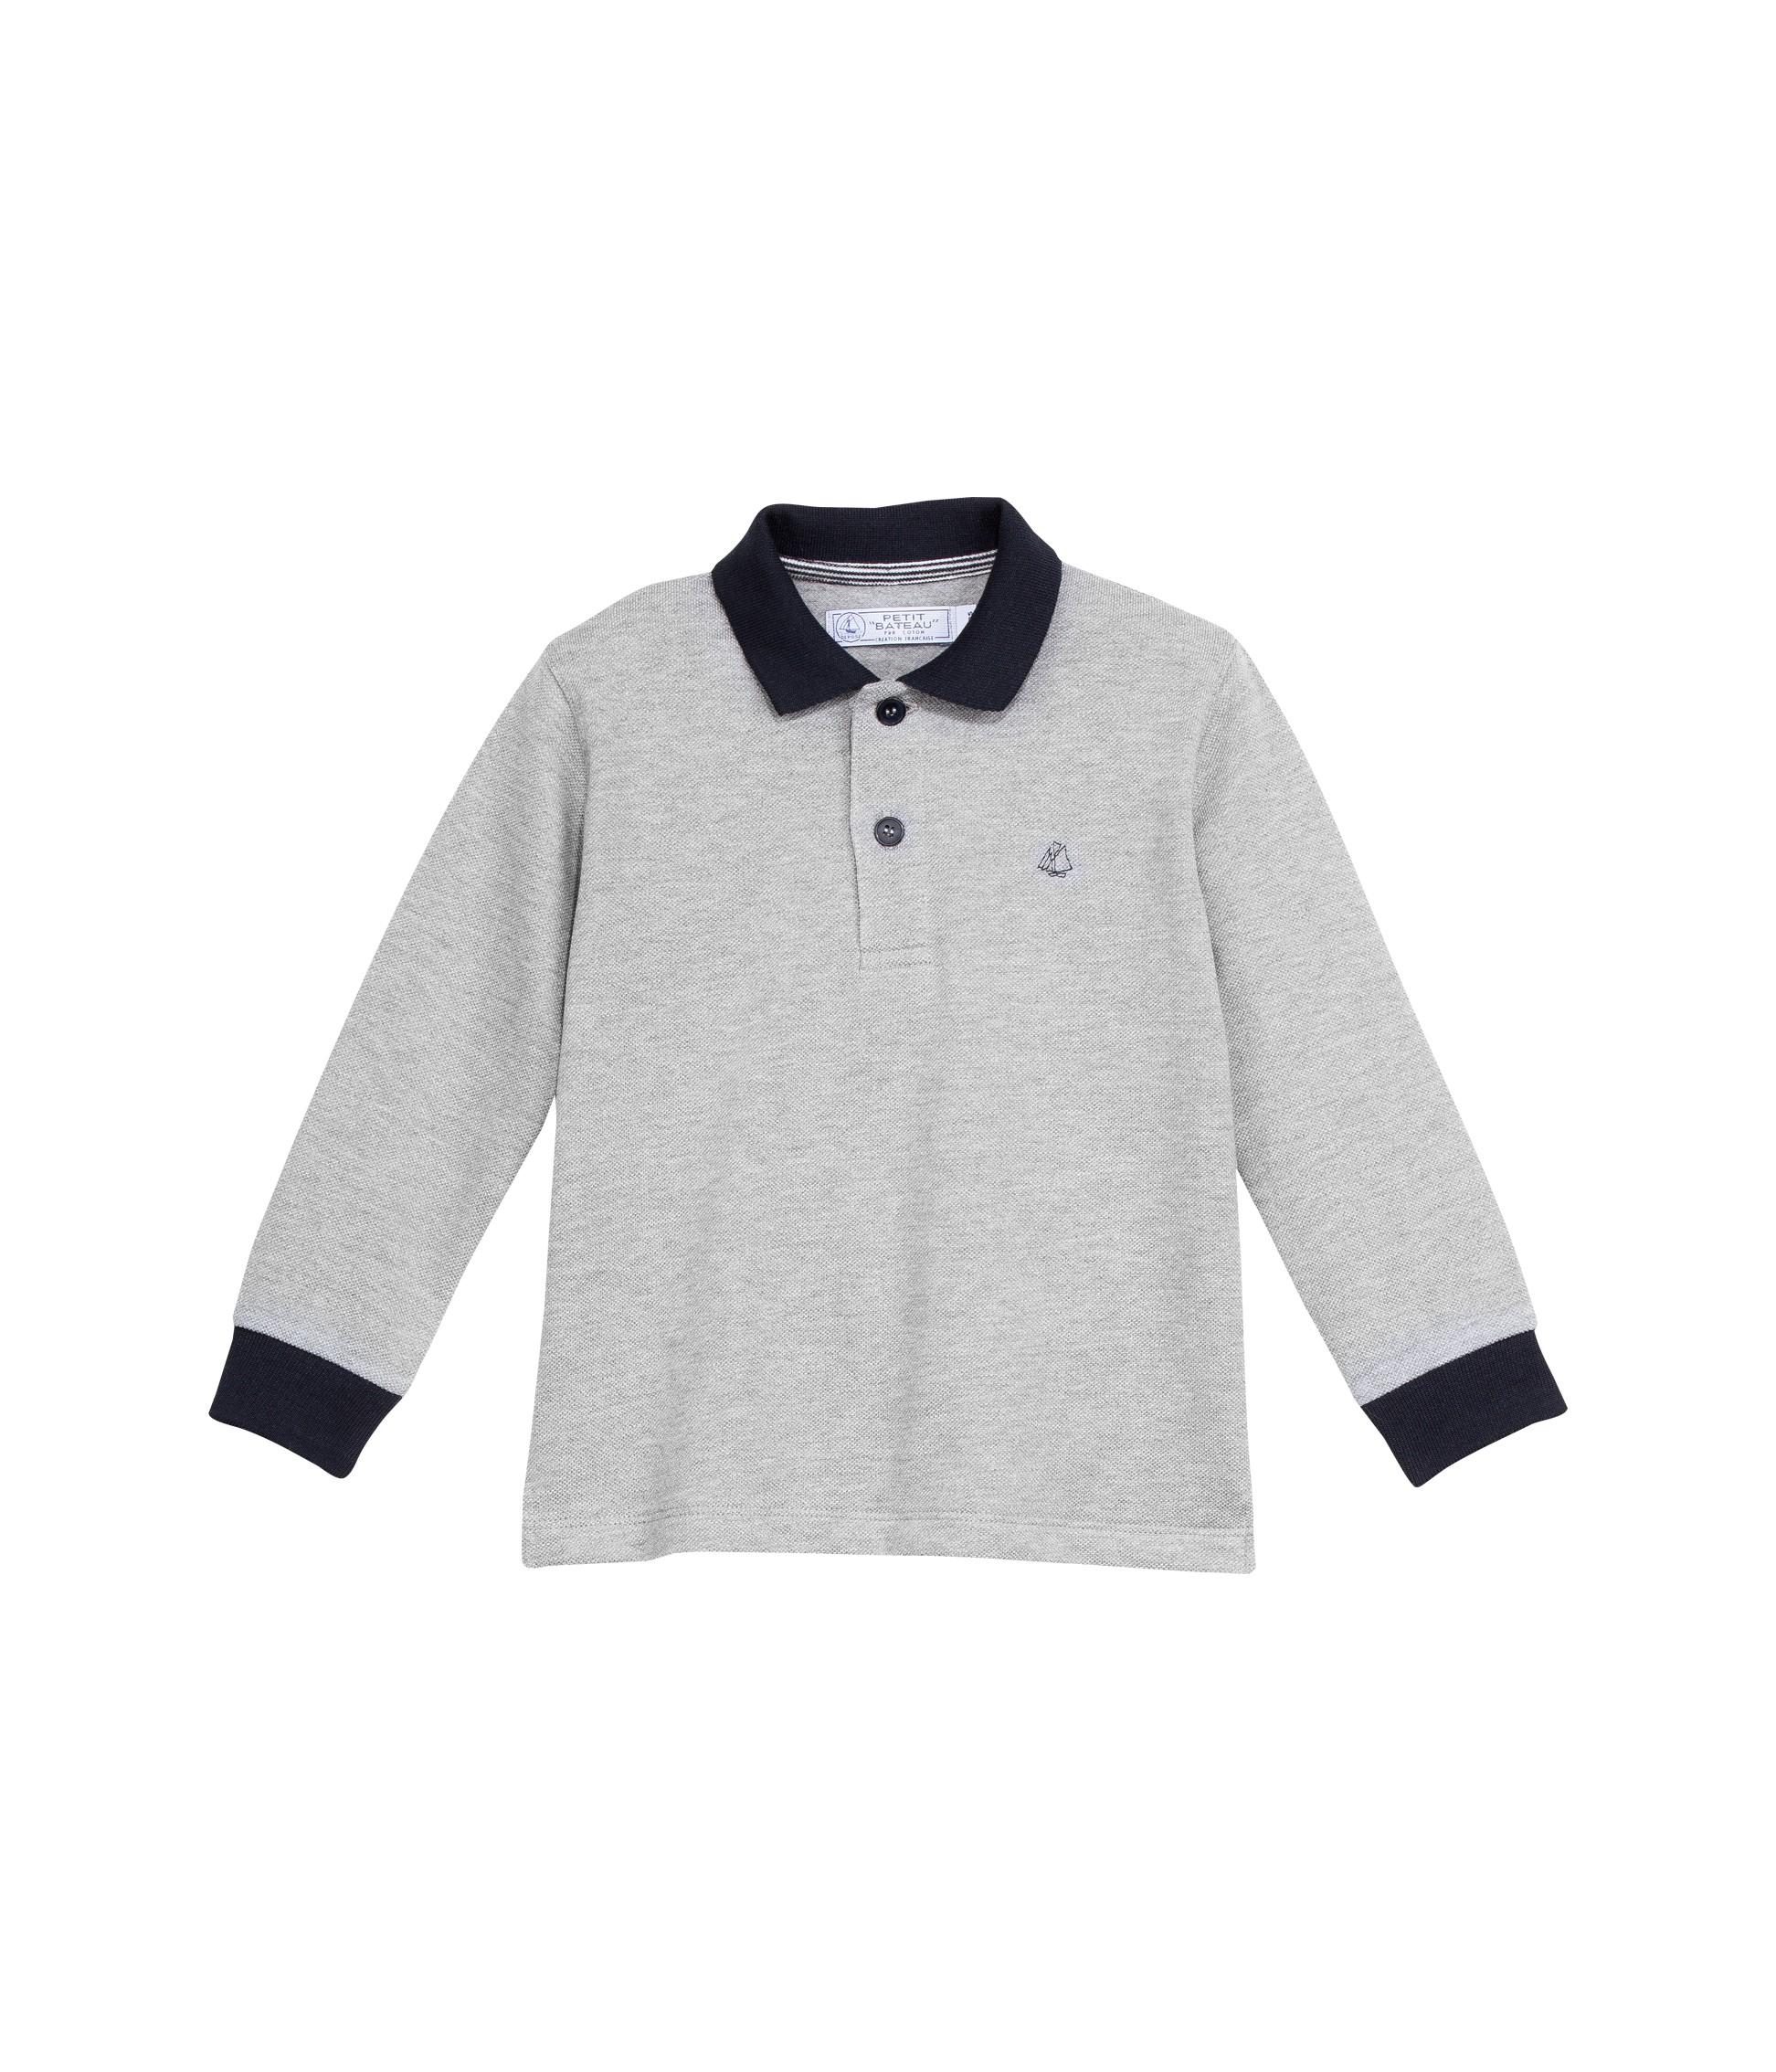 79ff54ba8b PETIT BATEAU Polo shirt boy long-sleeved grey